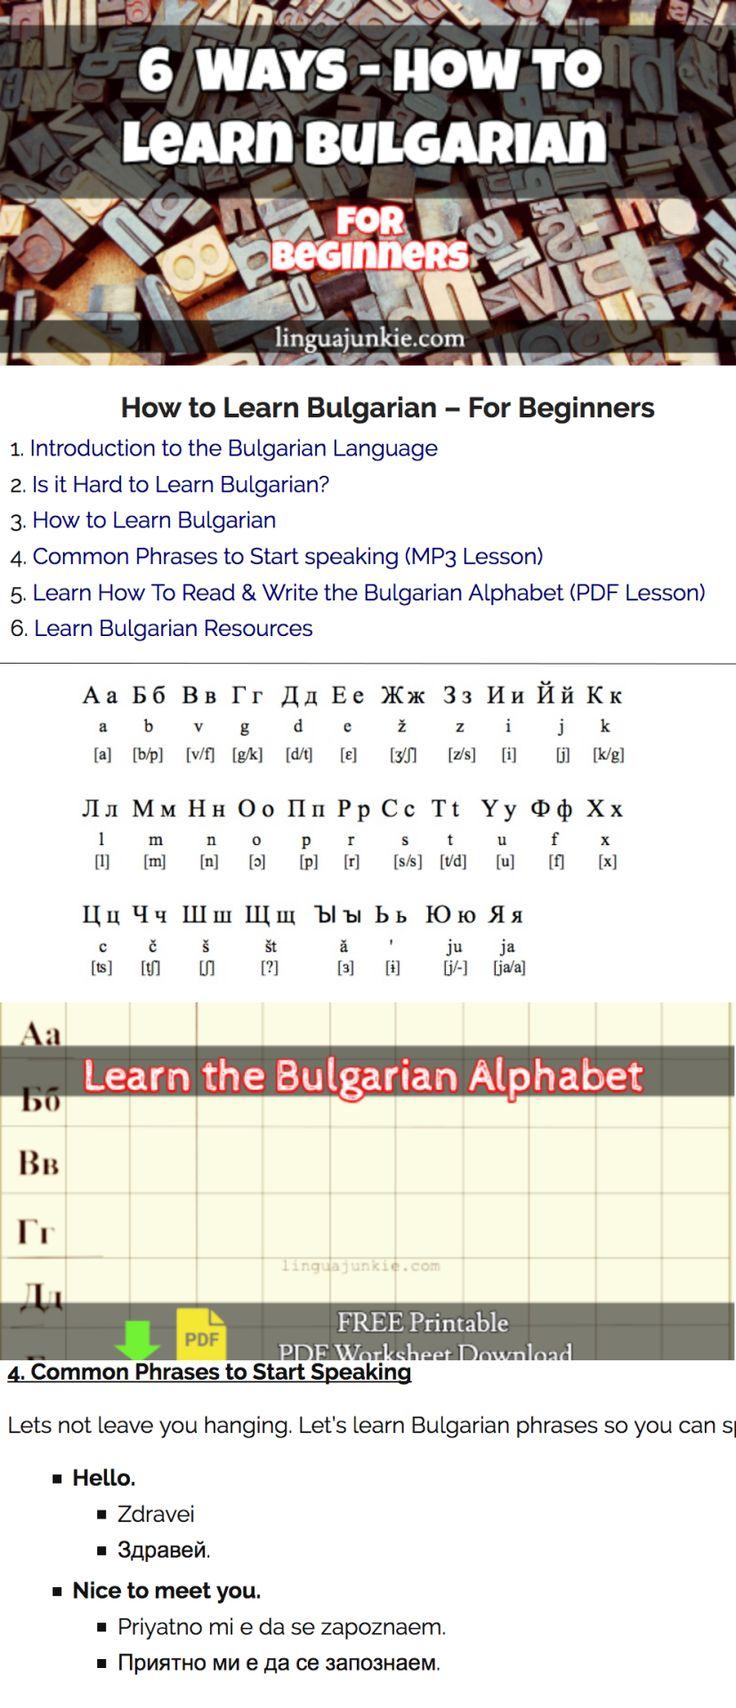 6 Ways to.. #learnbulgarian #bulgarian http://www.linguajunkie.com/learn-bulgarian